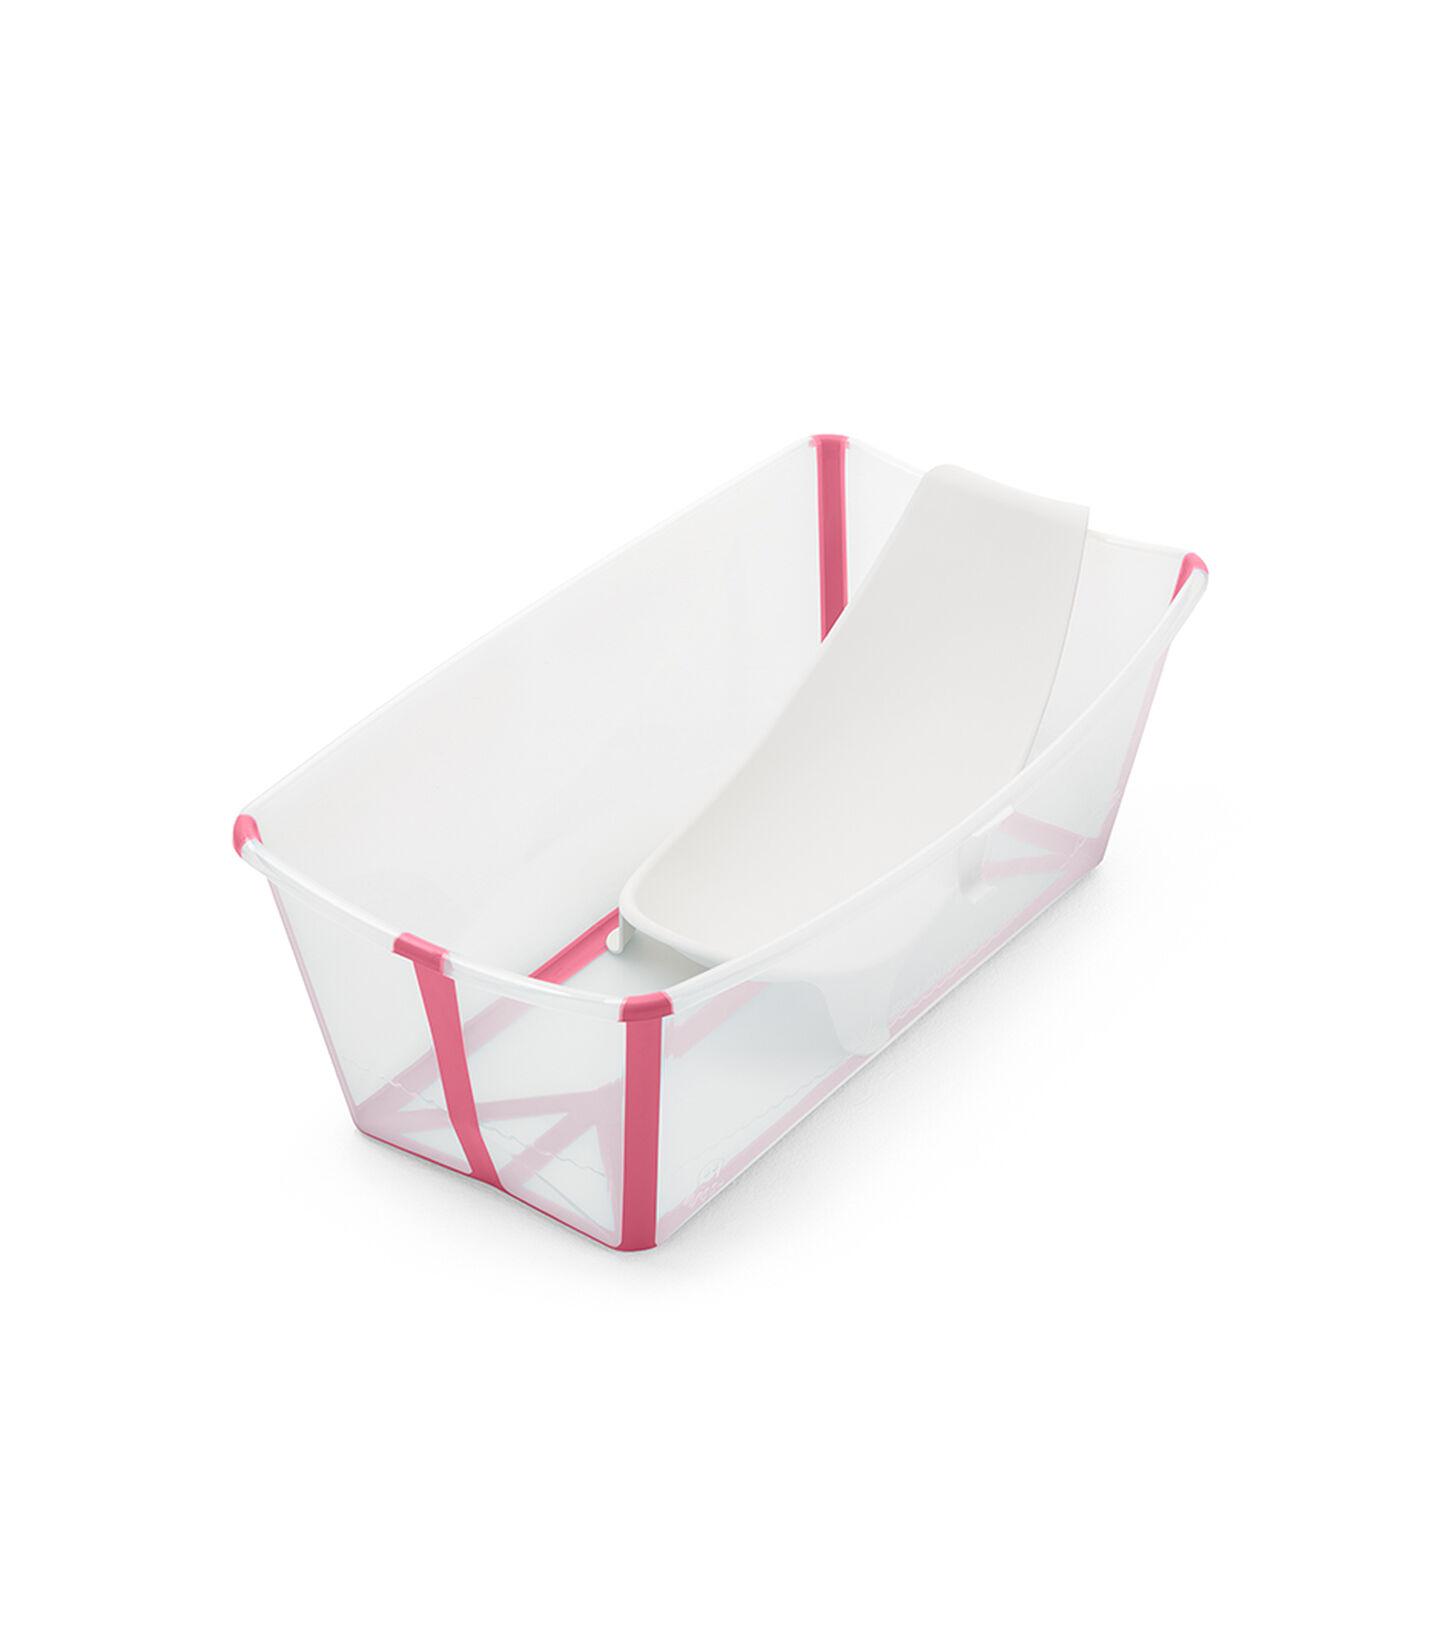 Stokke® Flexi Bath® bath tub, Transparent Pink with Newborn insert. view 2